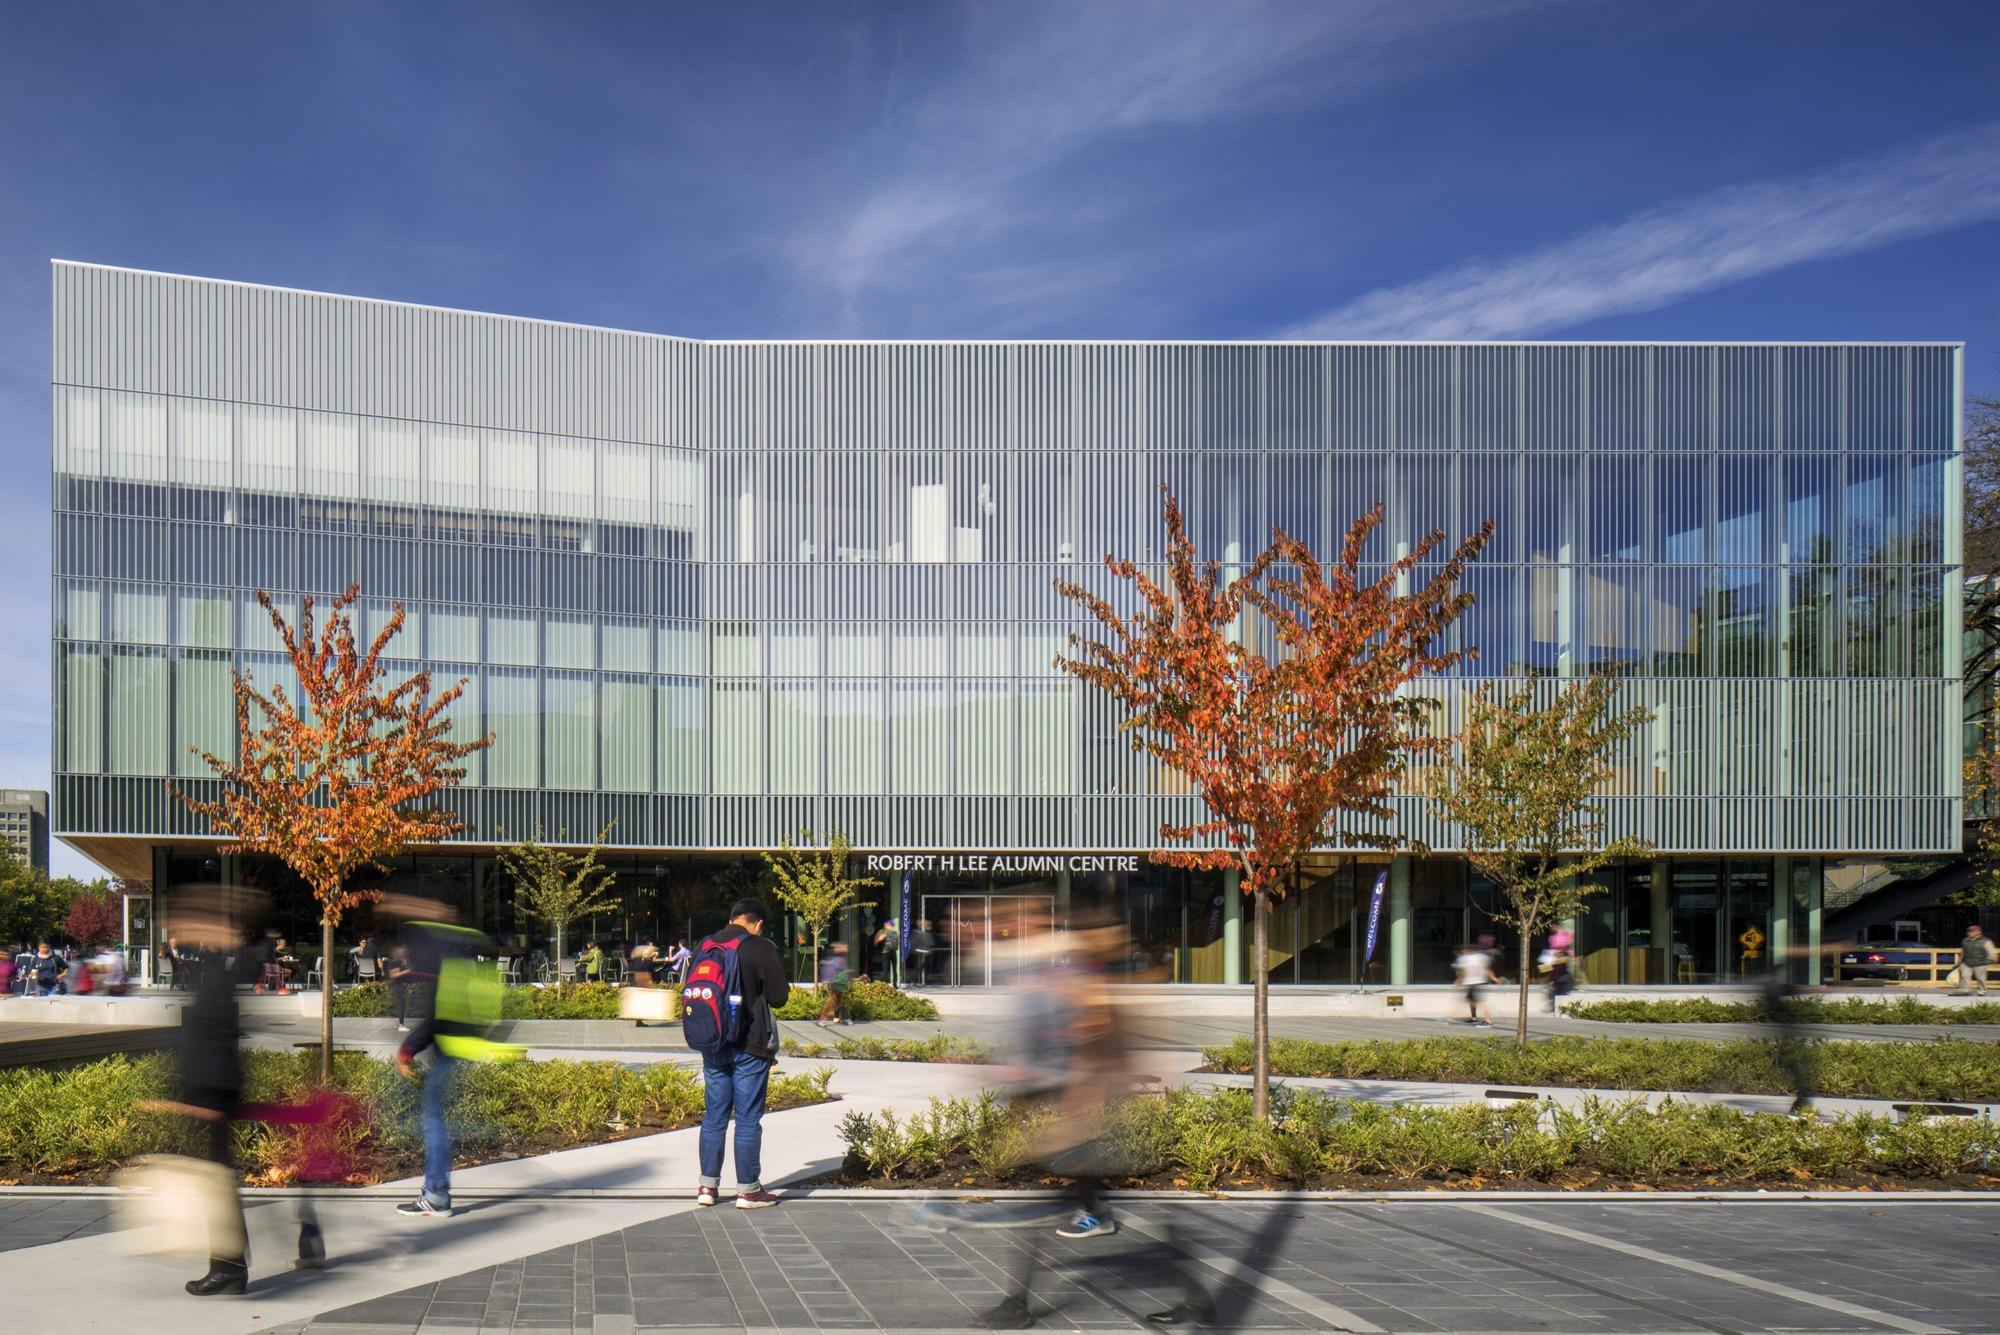 Robert H. Lee Alumni Centre / Hughes Condon Marler Architects + KPMB Architects